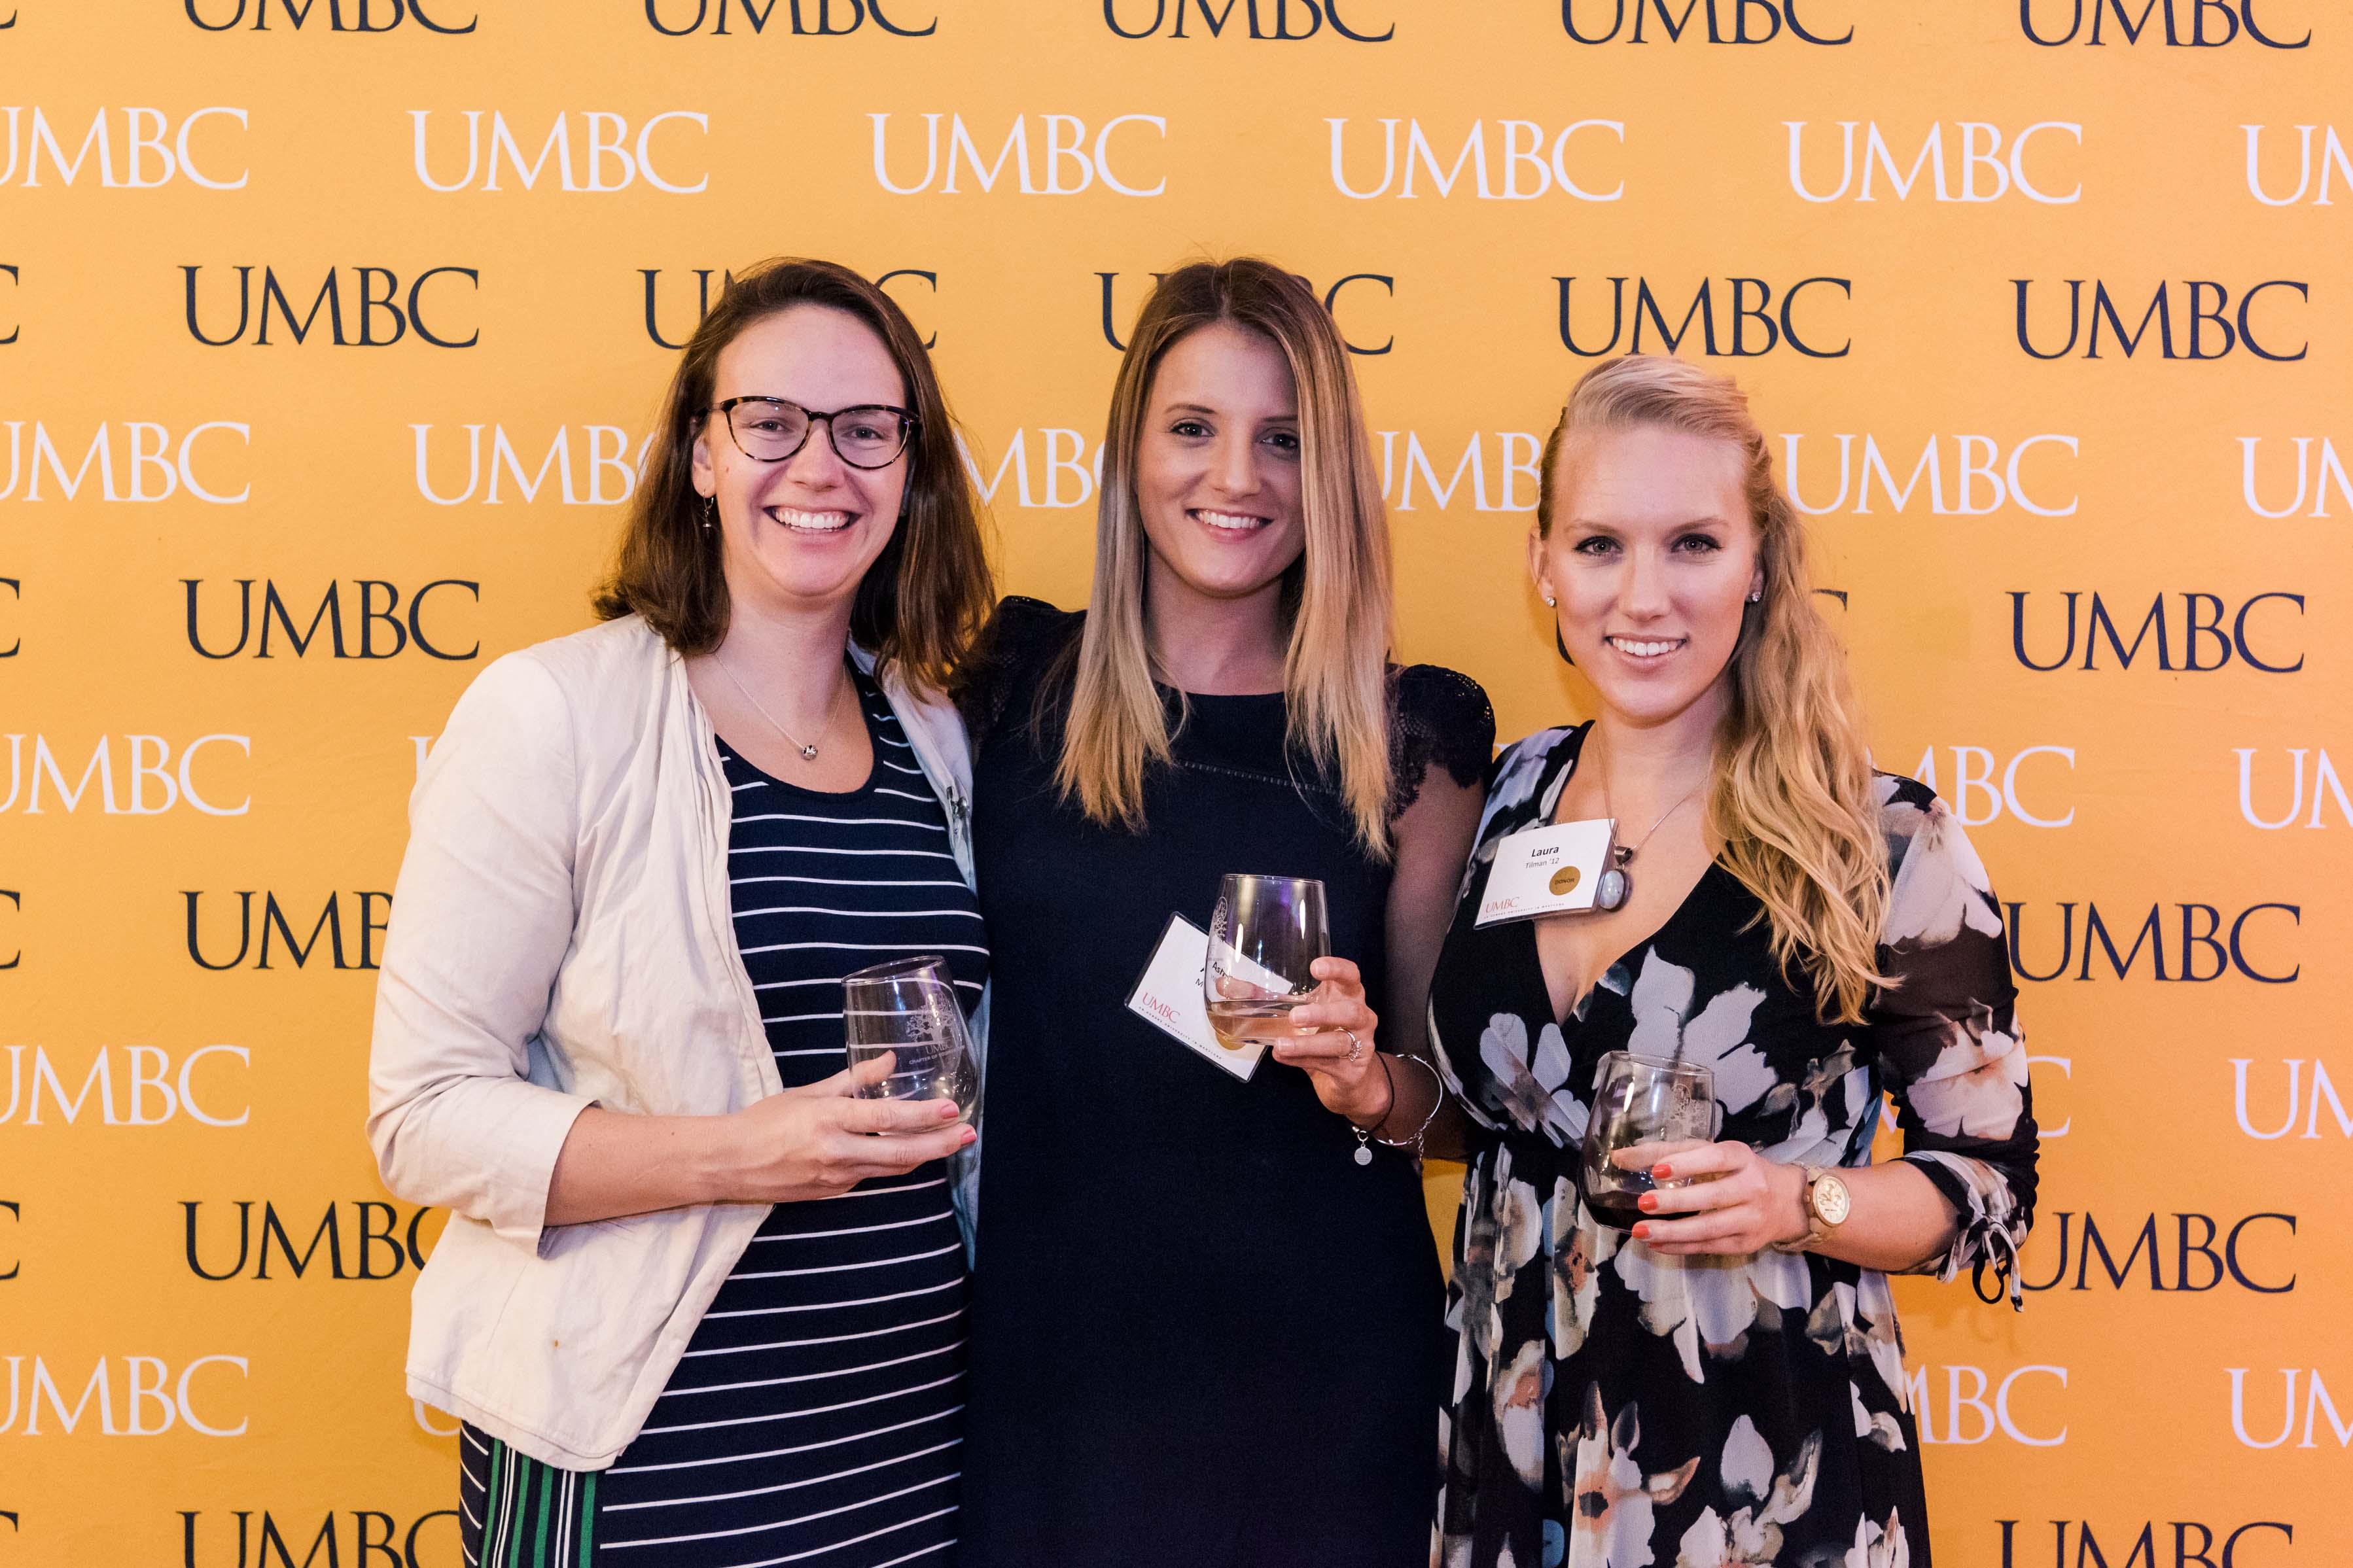 Three women pose with wine glasses at UMBC wall at 2018 wine tasting